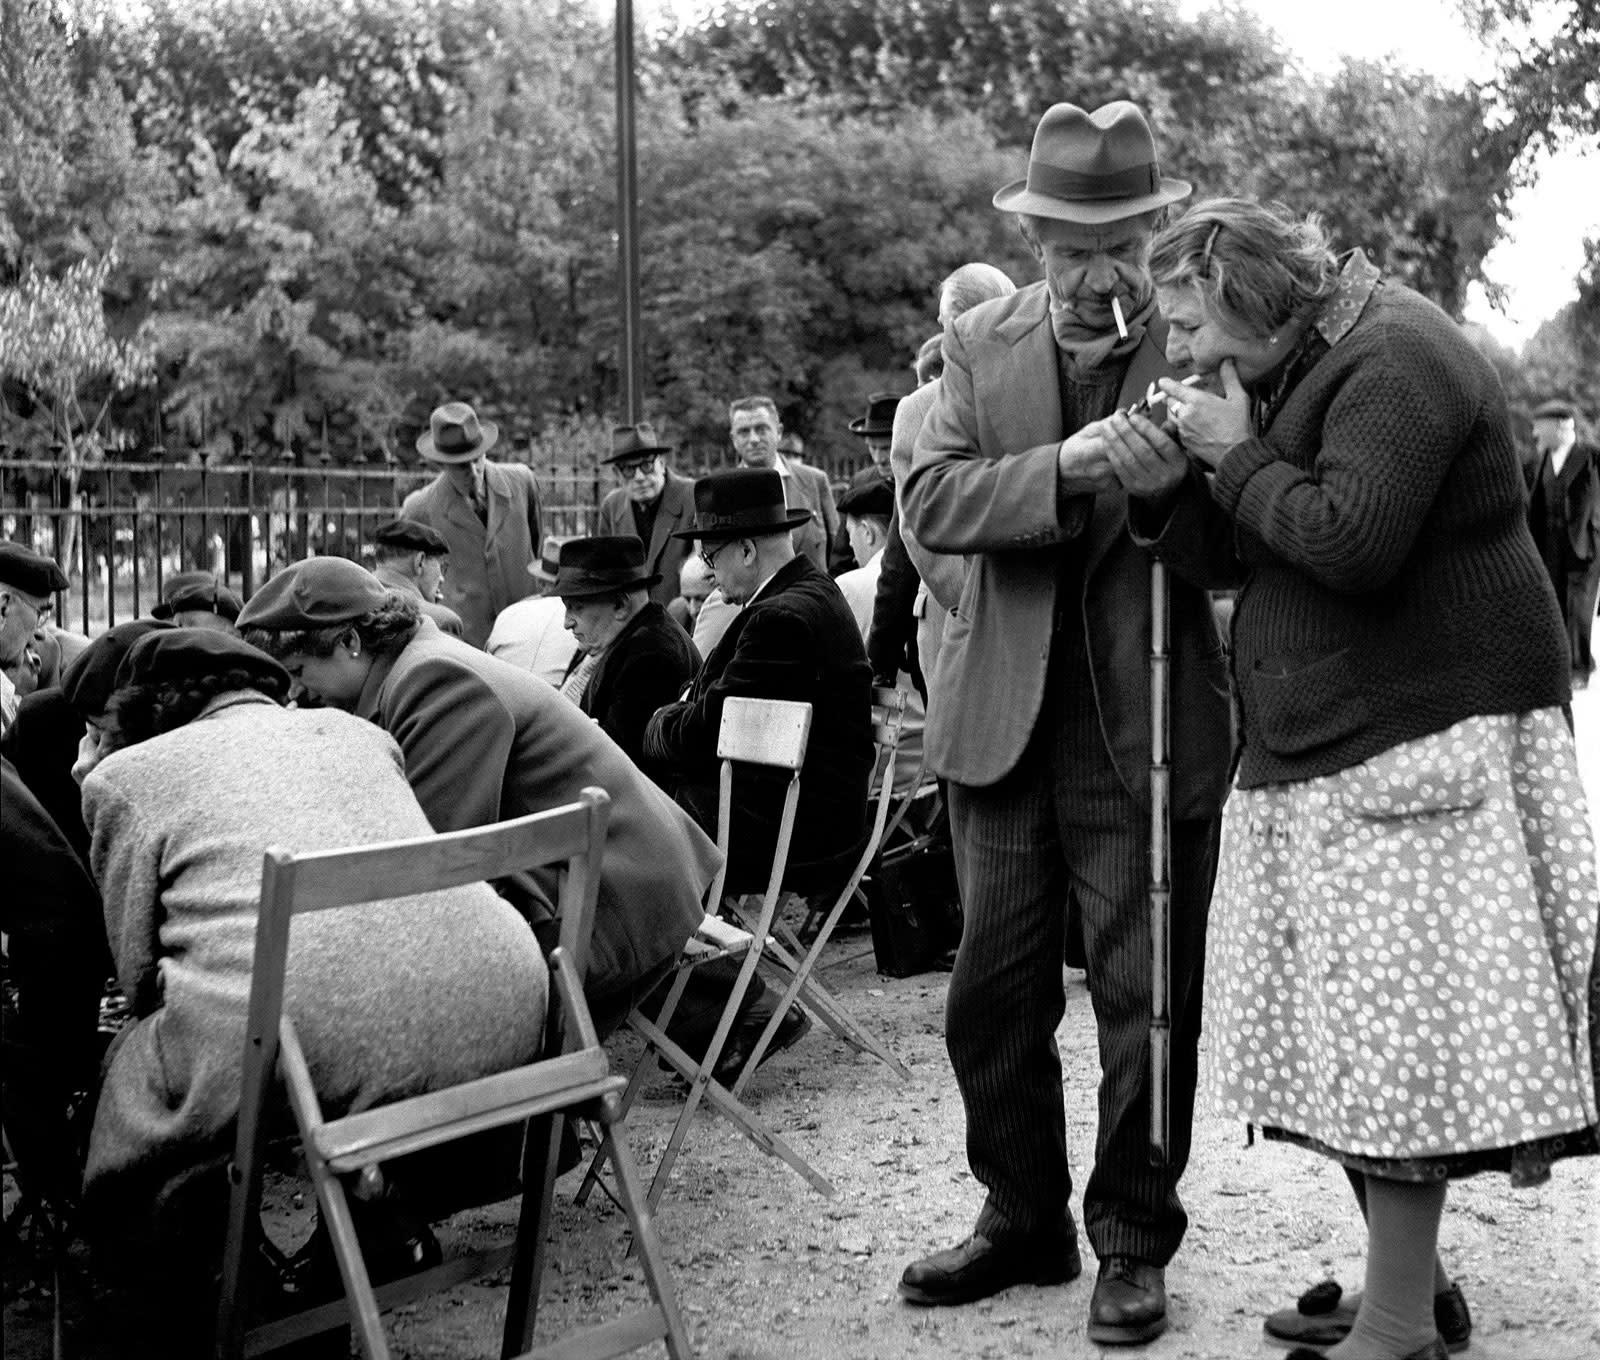 Sabine Weiss, Jardin des Plantes, Paris, 1952